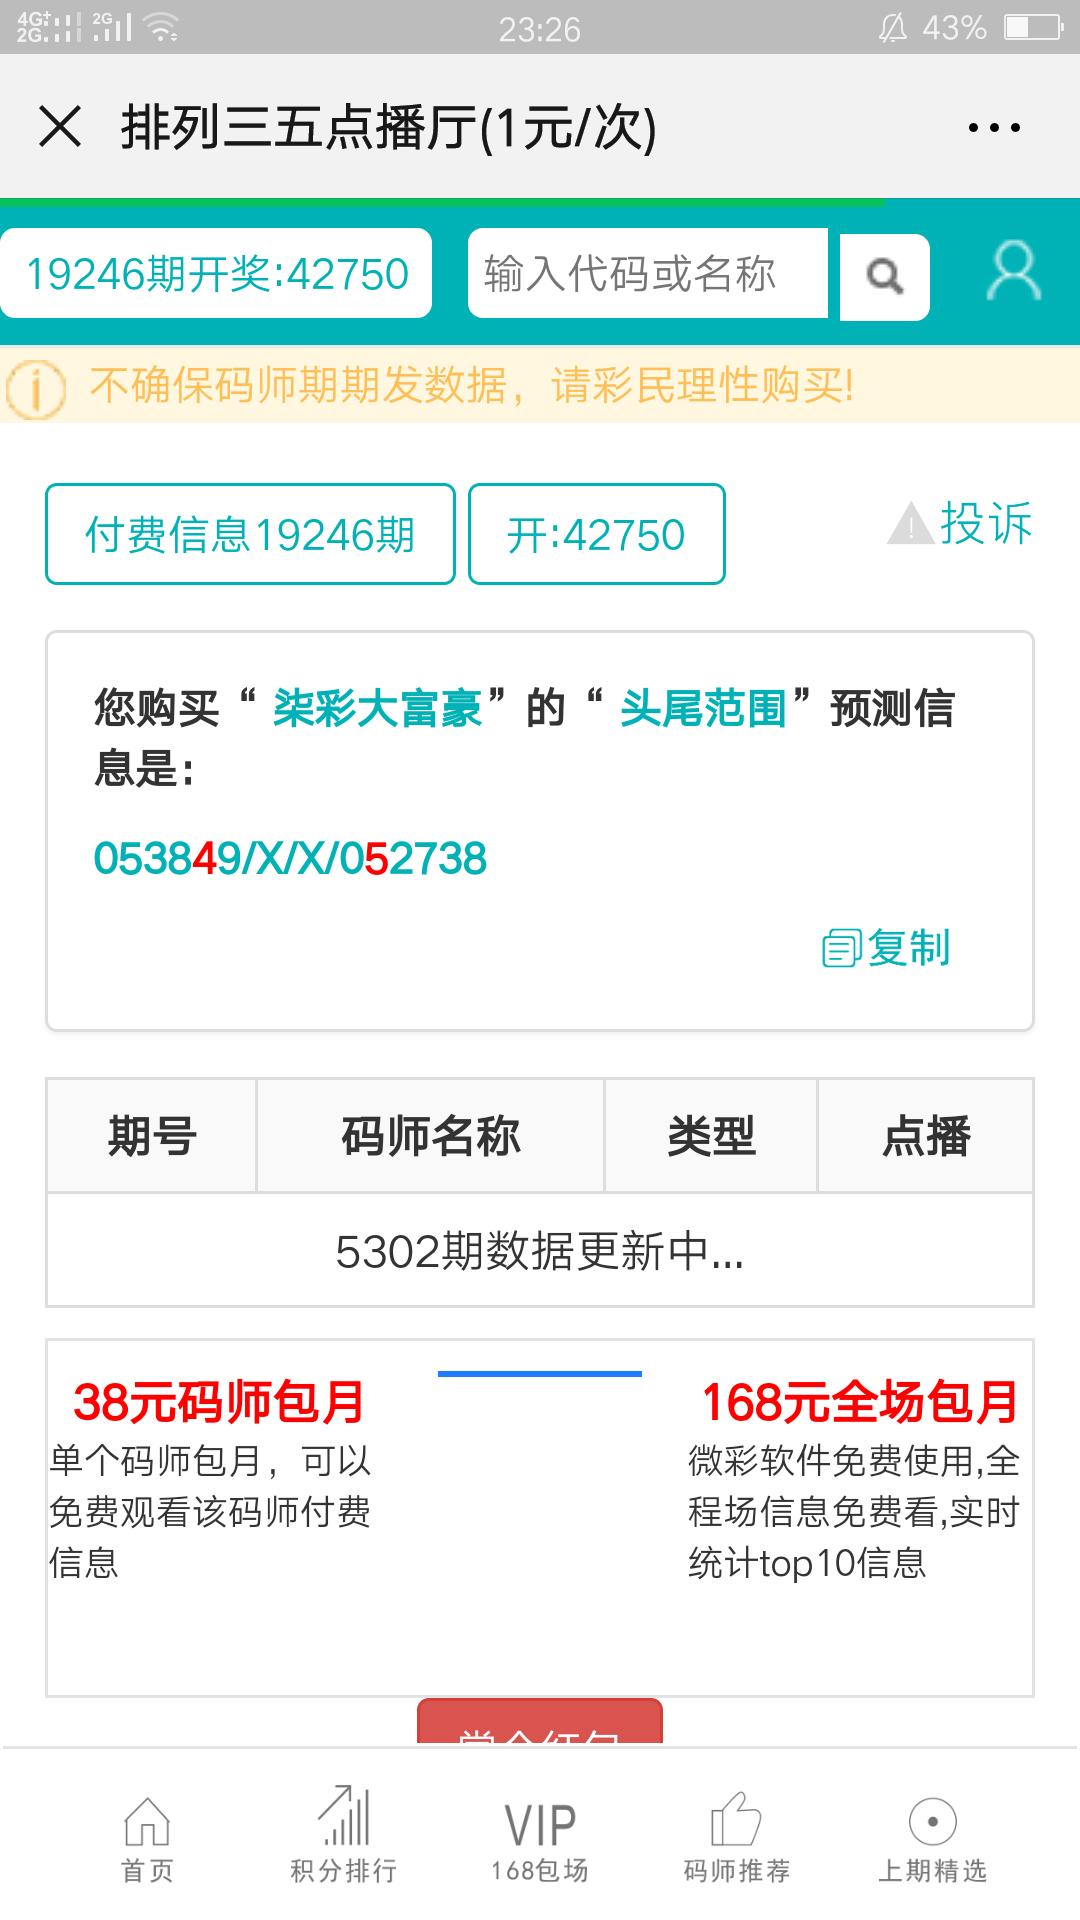 Screenshot_2019-09-10-23-26-58-49.png